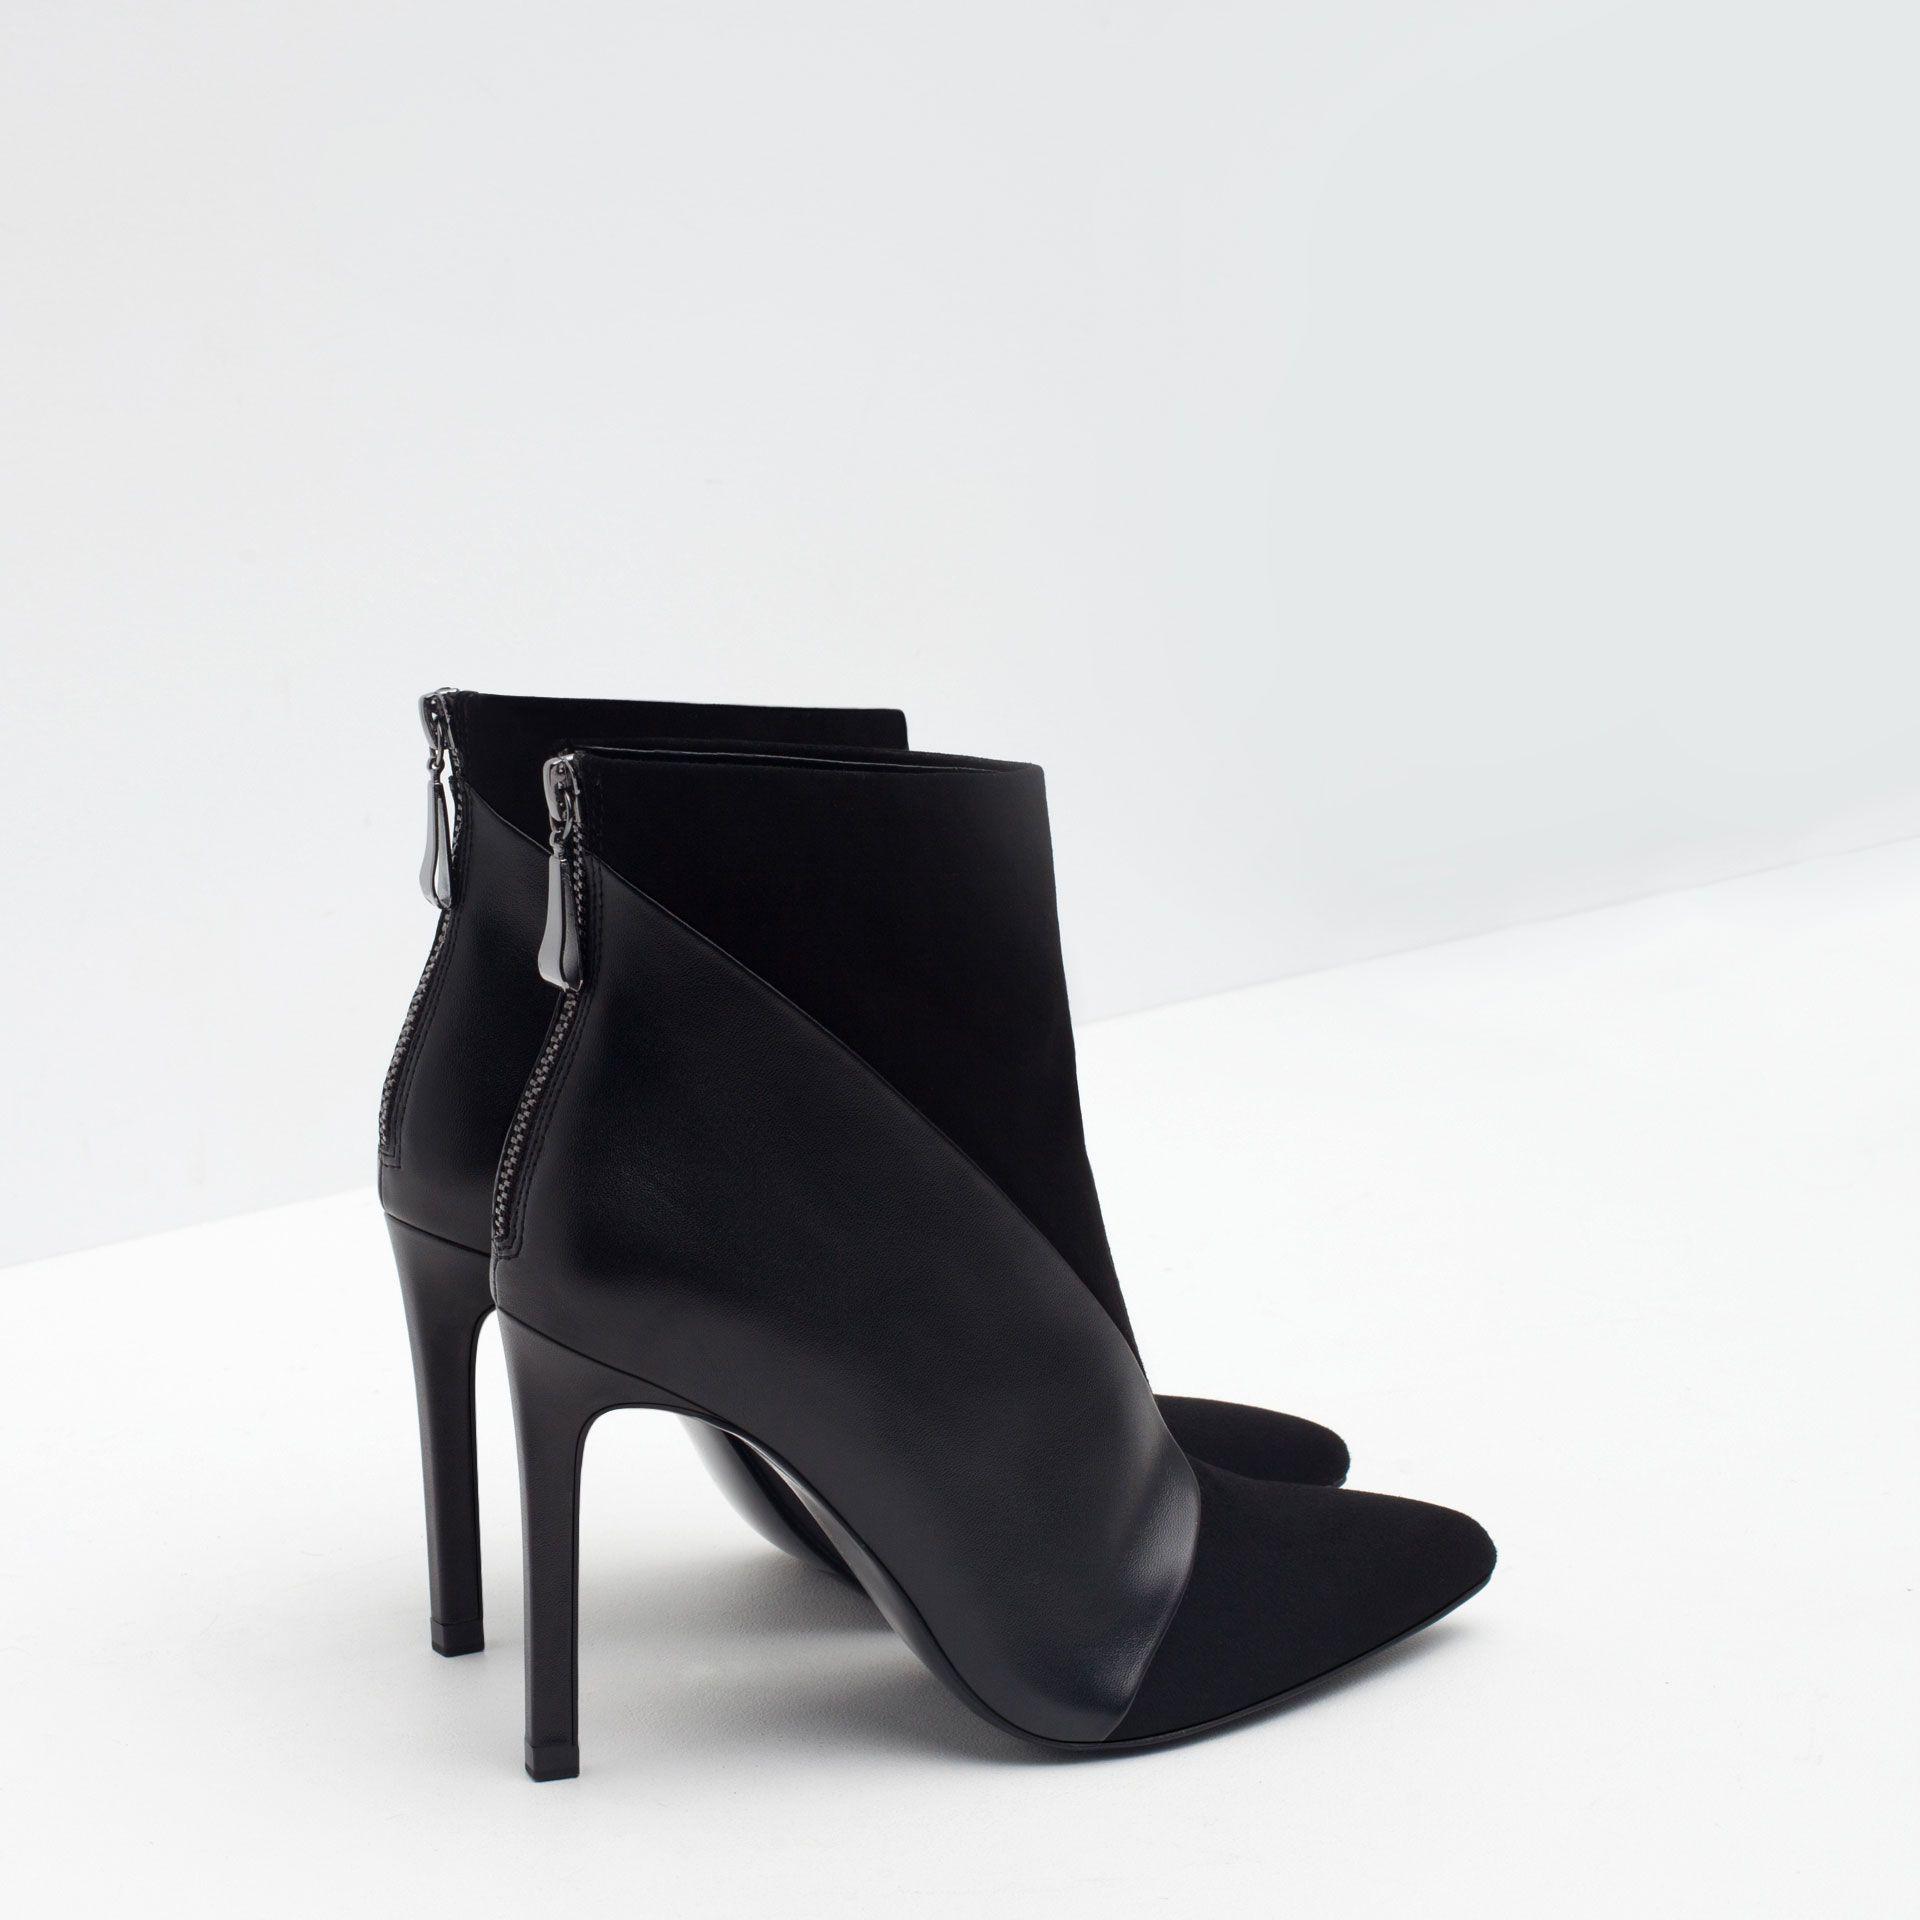 bottines talon en cuir chaussures et sacs femme. Black Bedroom Furniture Sets. Home Design Ideas